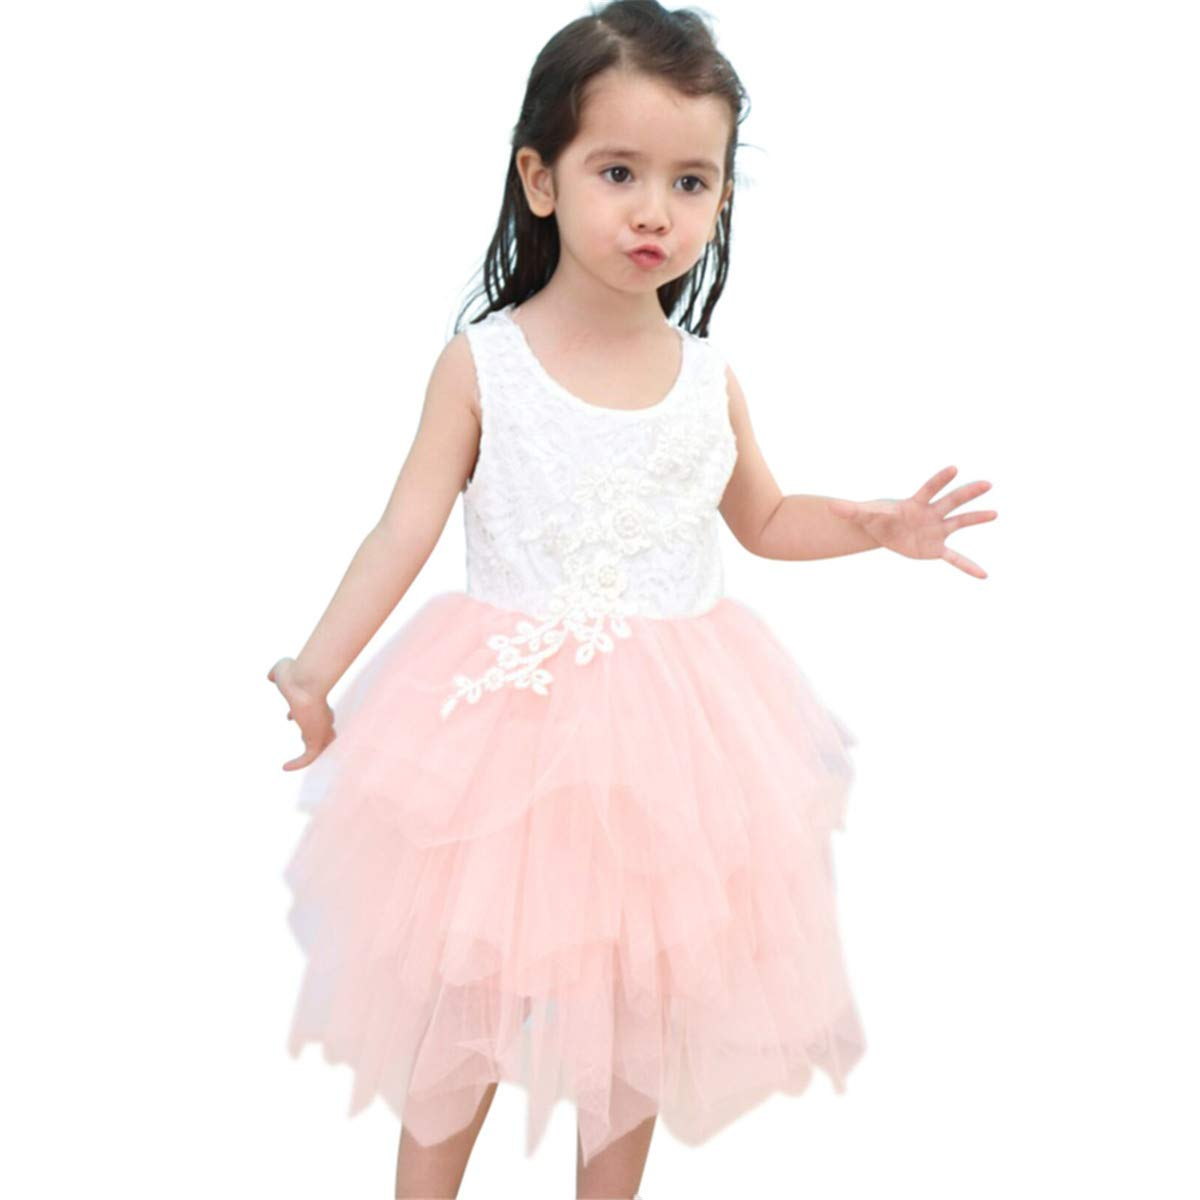 e79d20bb5287 Titanos Kids Lace Back Flower Girl Dress (Pink